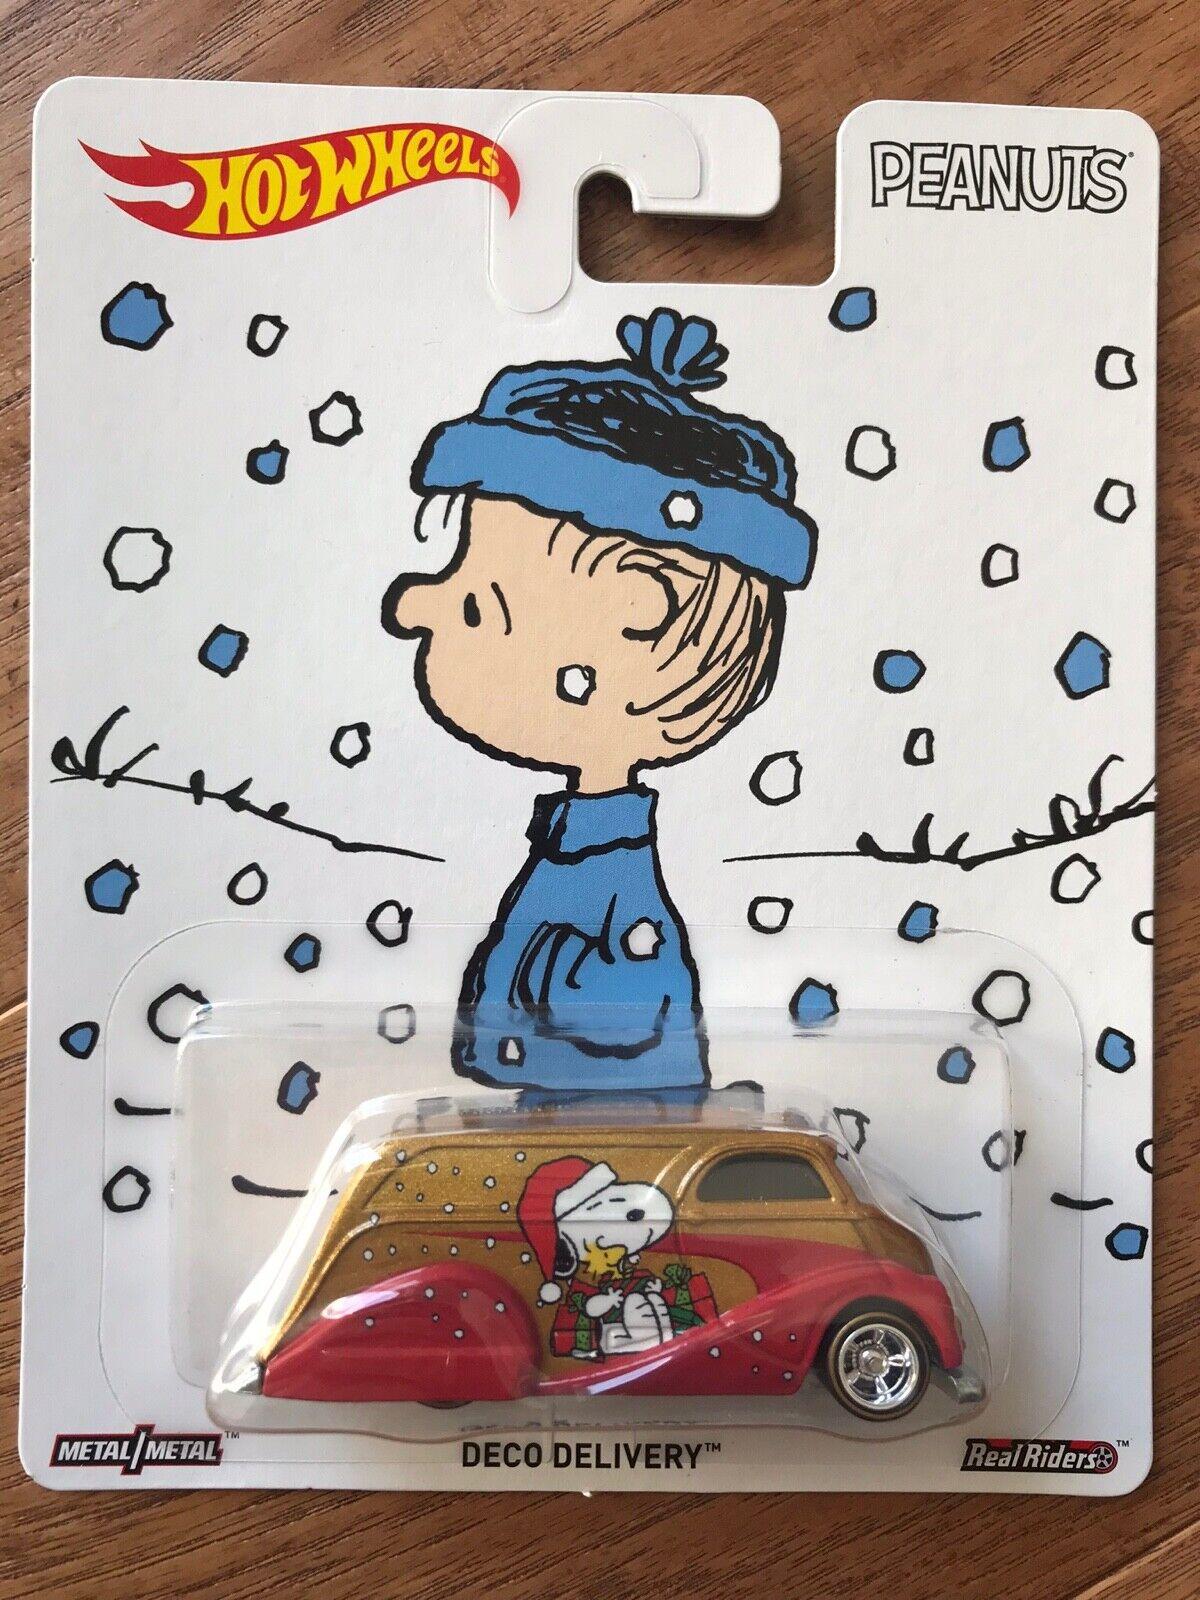 Real Riders DC Peanuts Disney Hot Wheels Pop Culture Selection Nestle